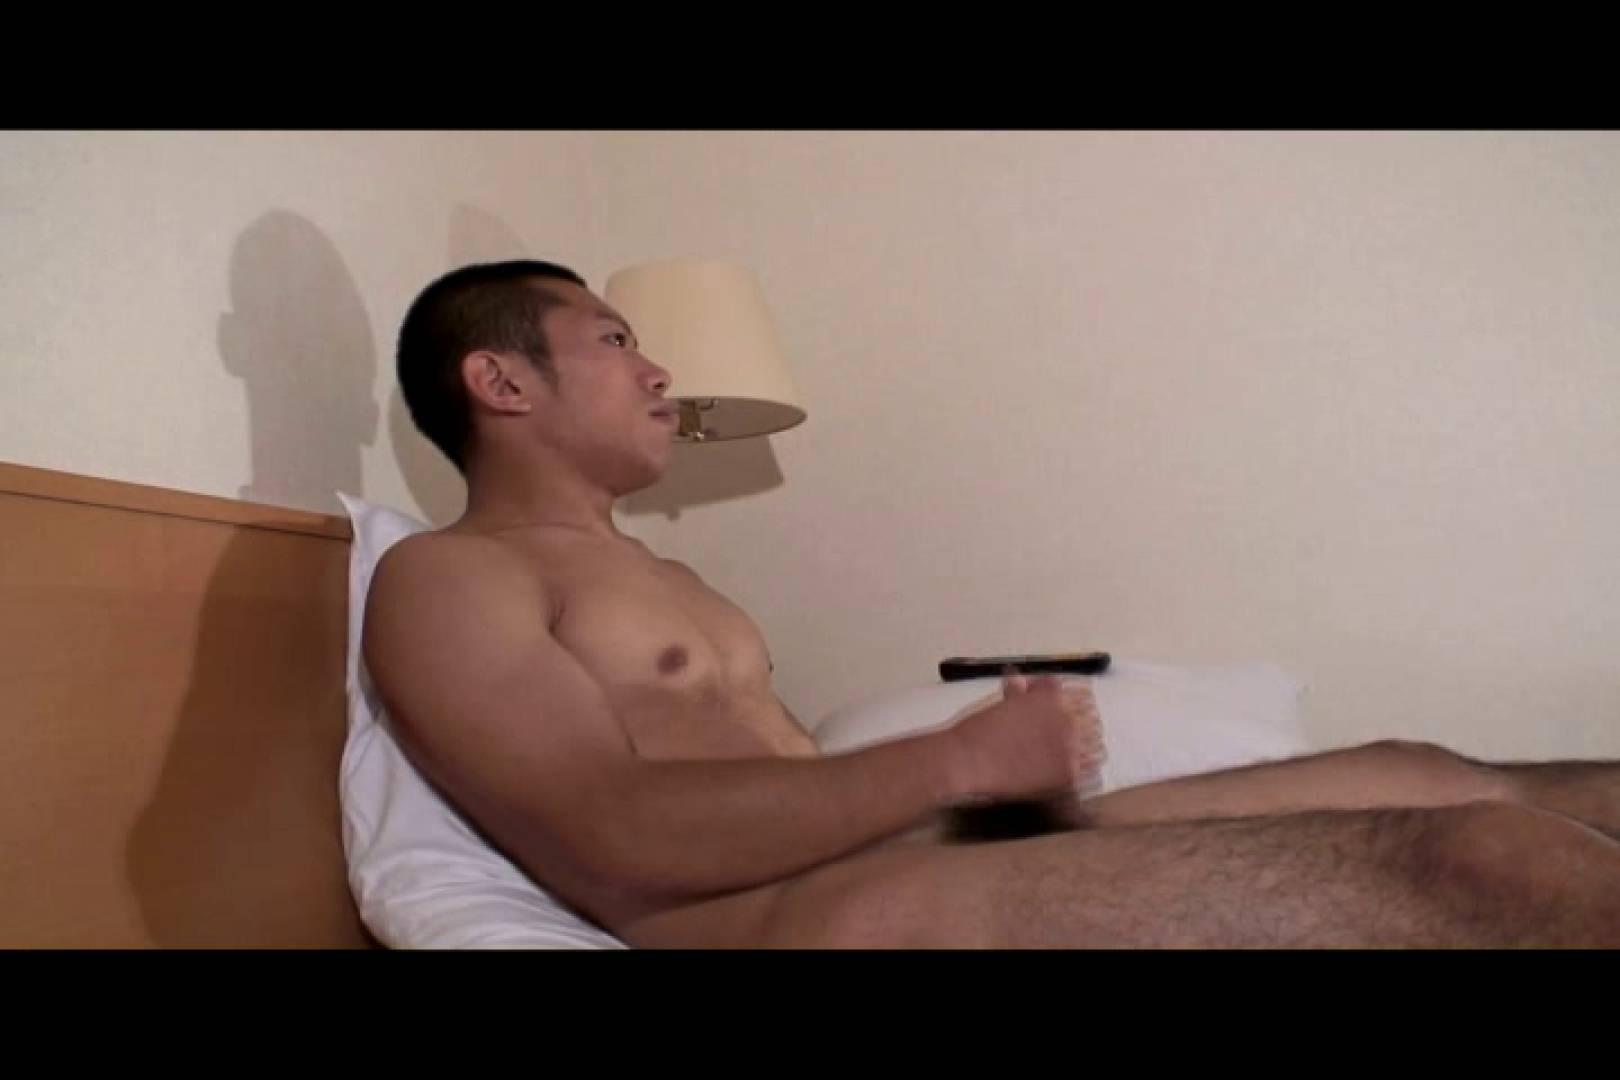 Bistro「イケメン」~Mokkori和風仕立て~vol.04 イケメン  82pic 57